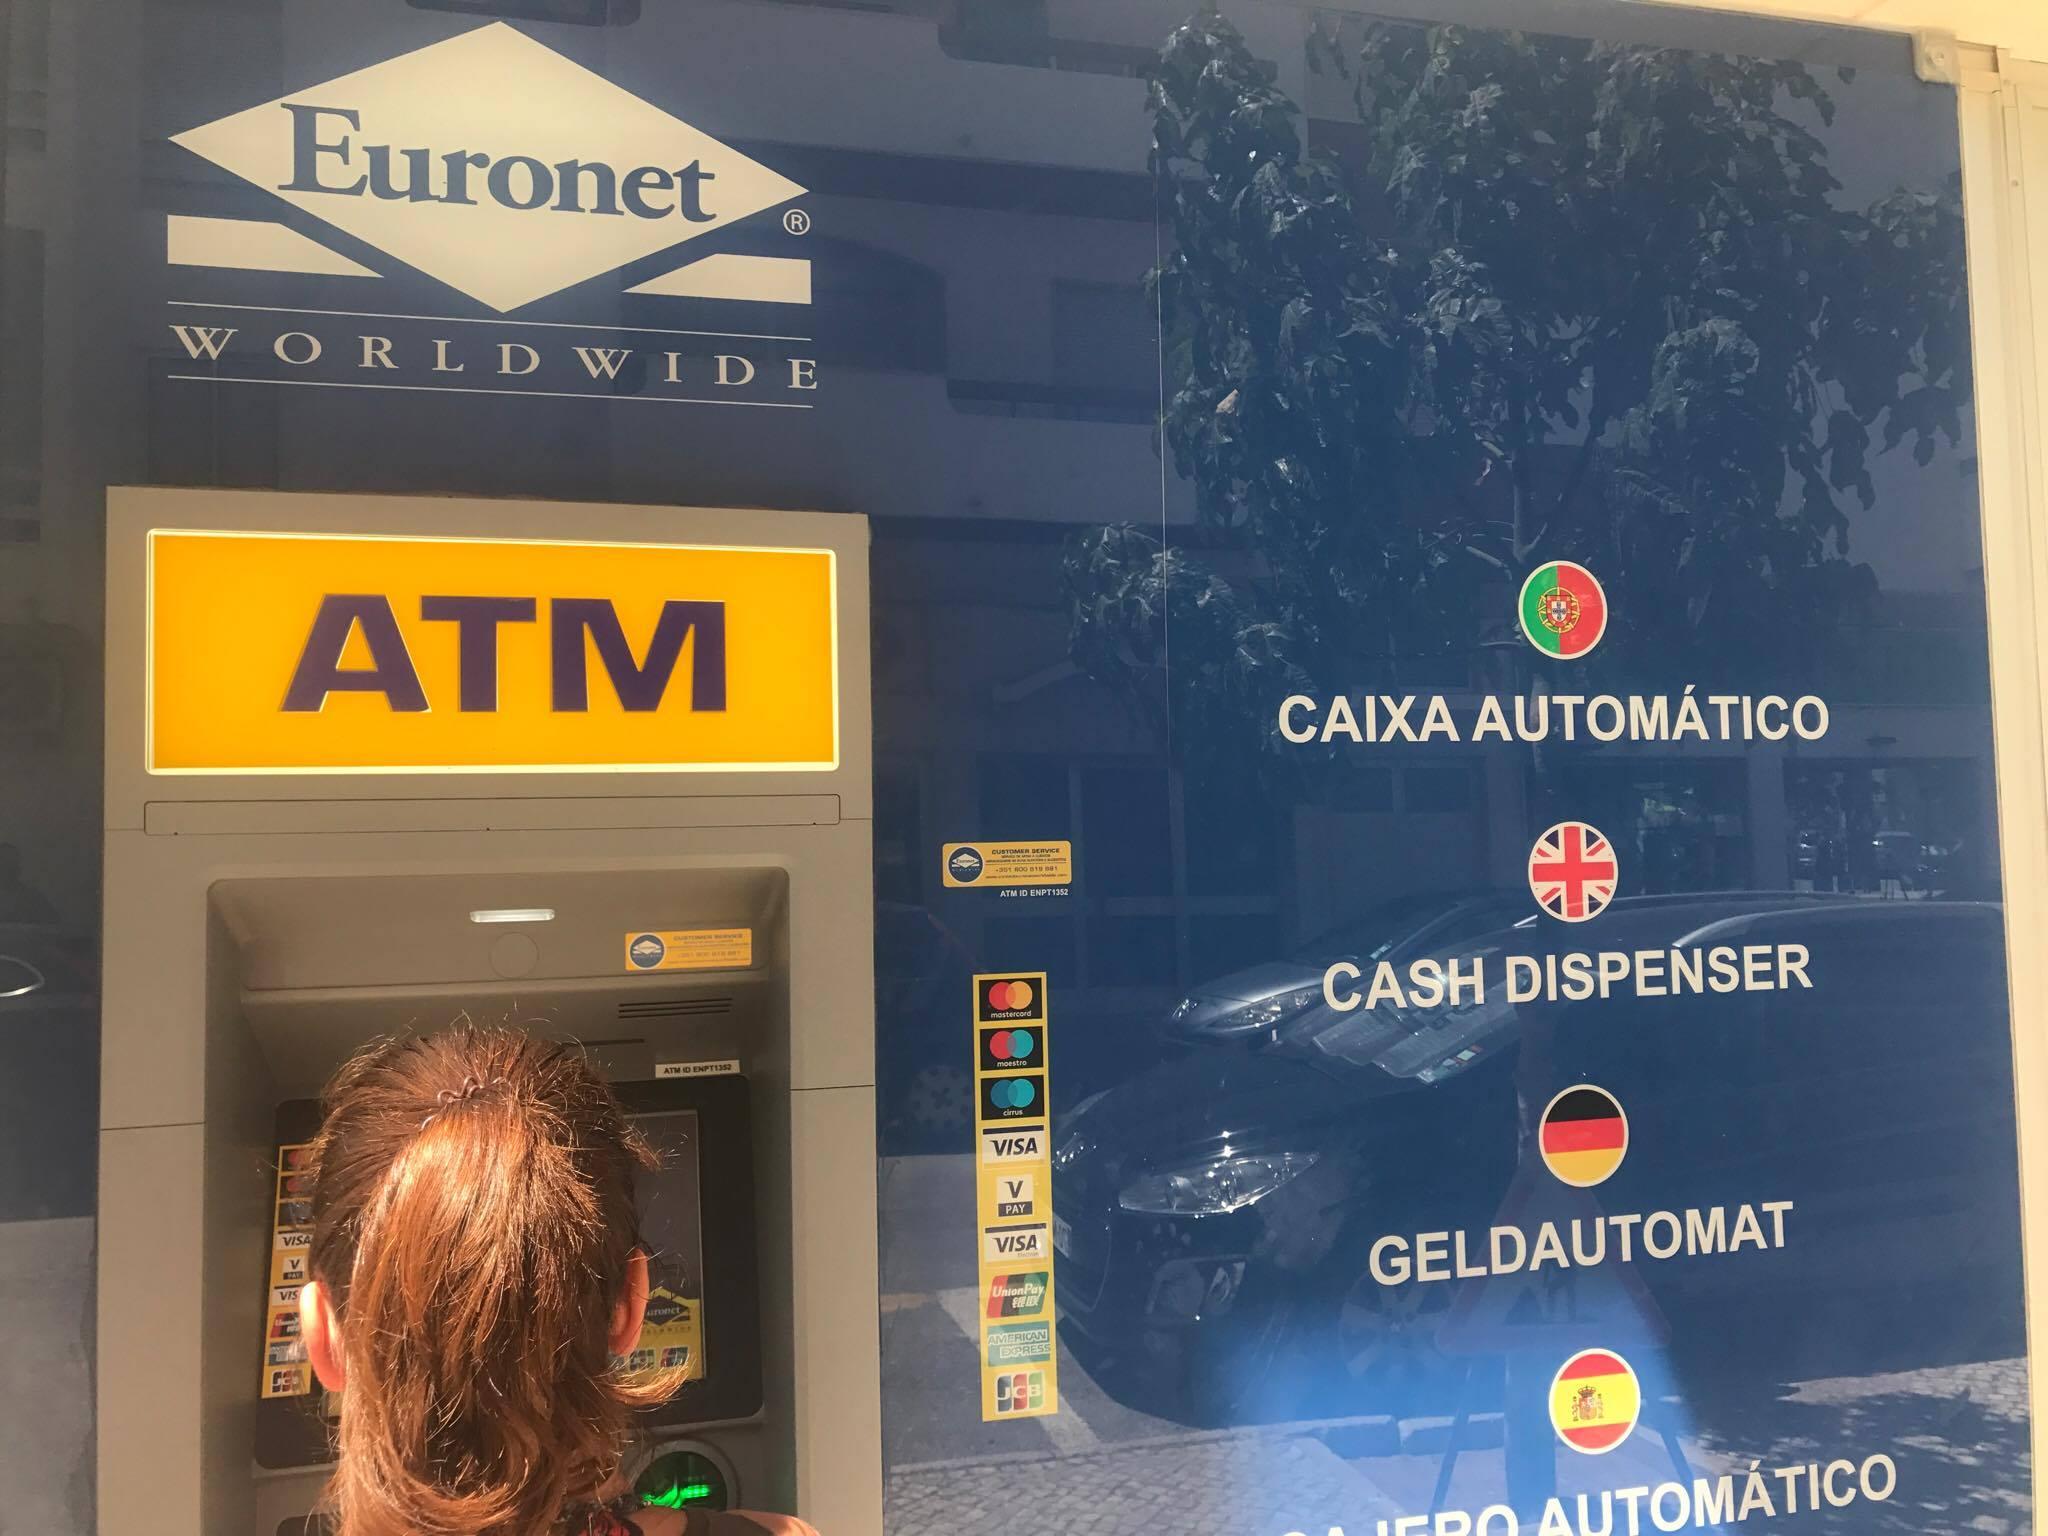 Vídeo: ATM